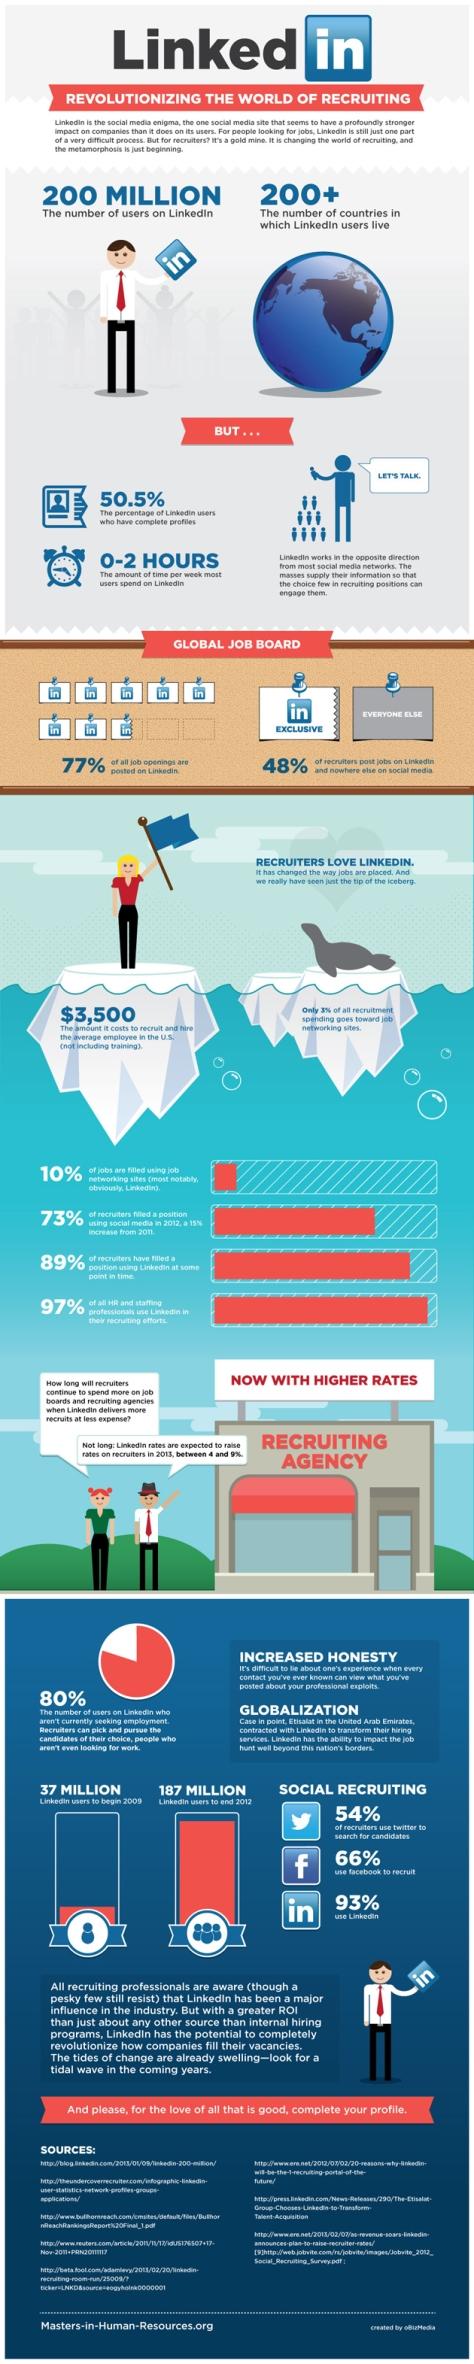 384459-linkedin-infographic